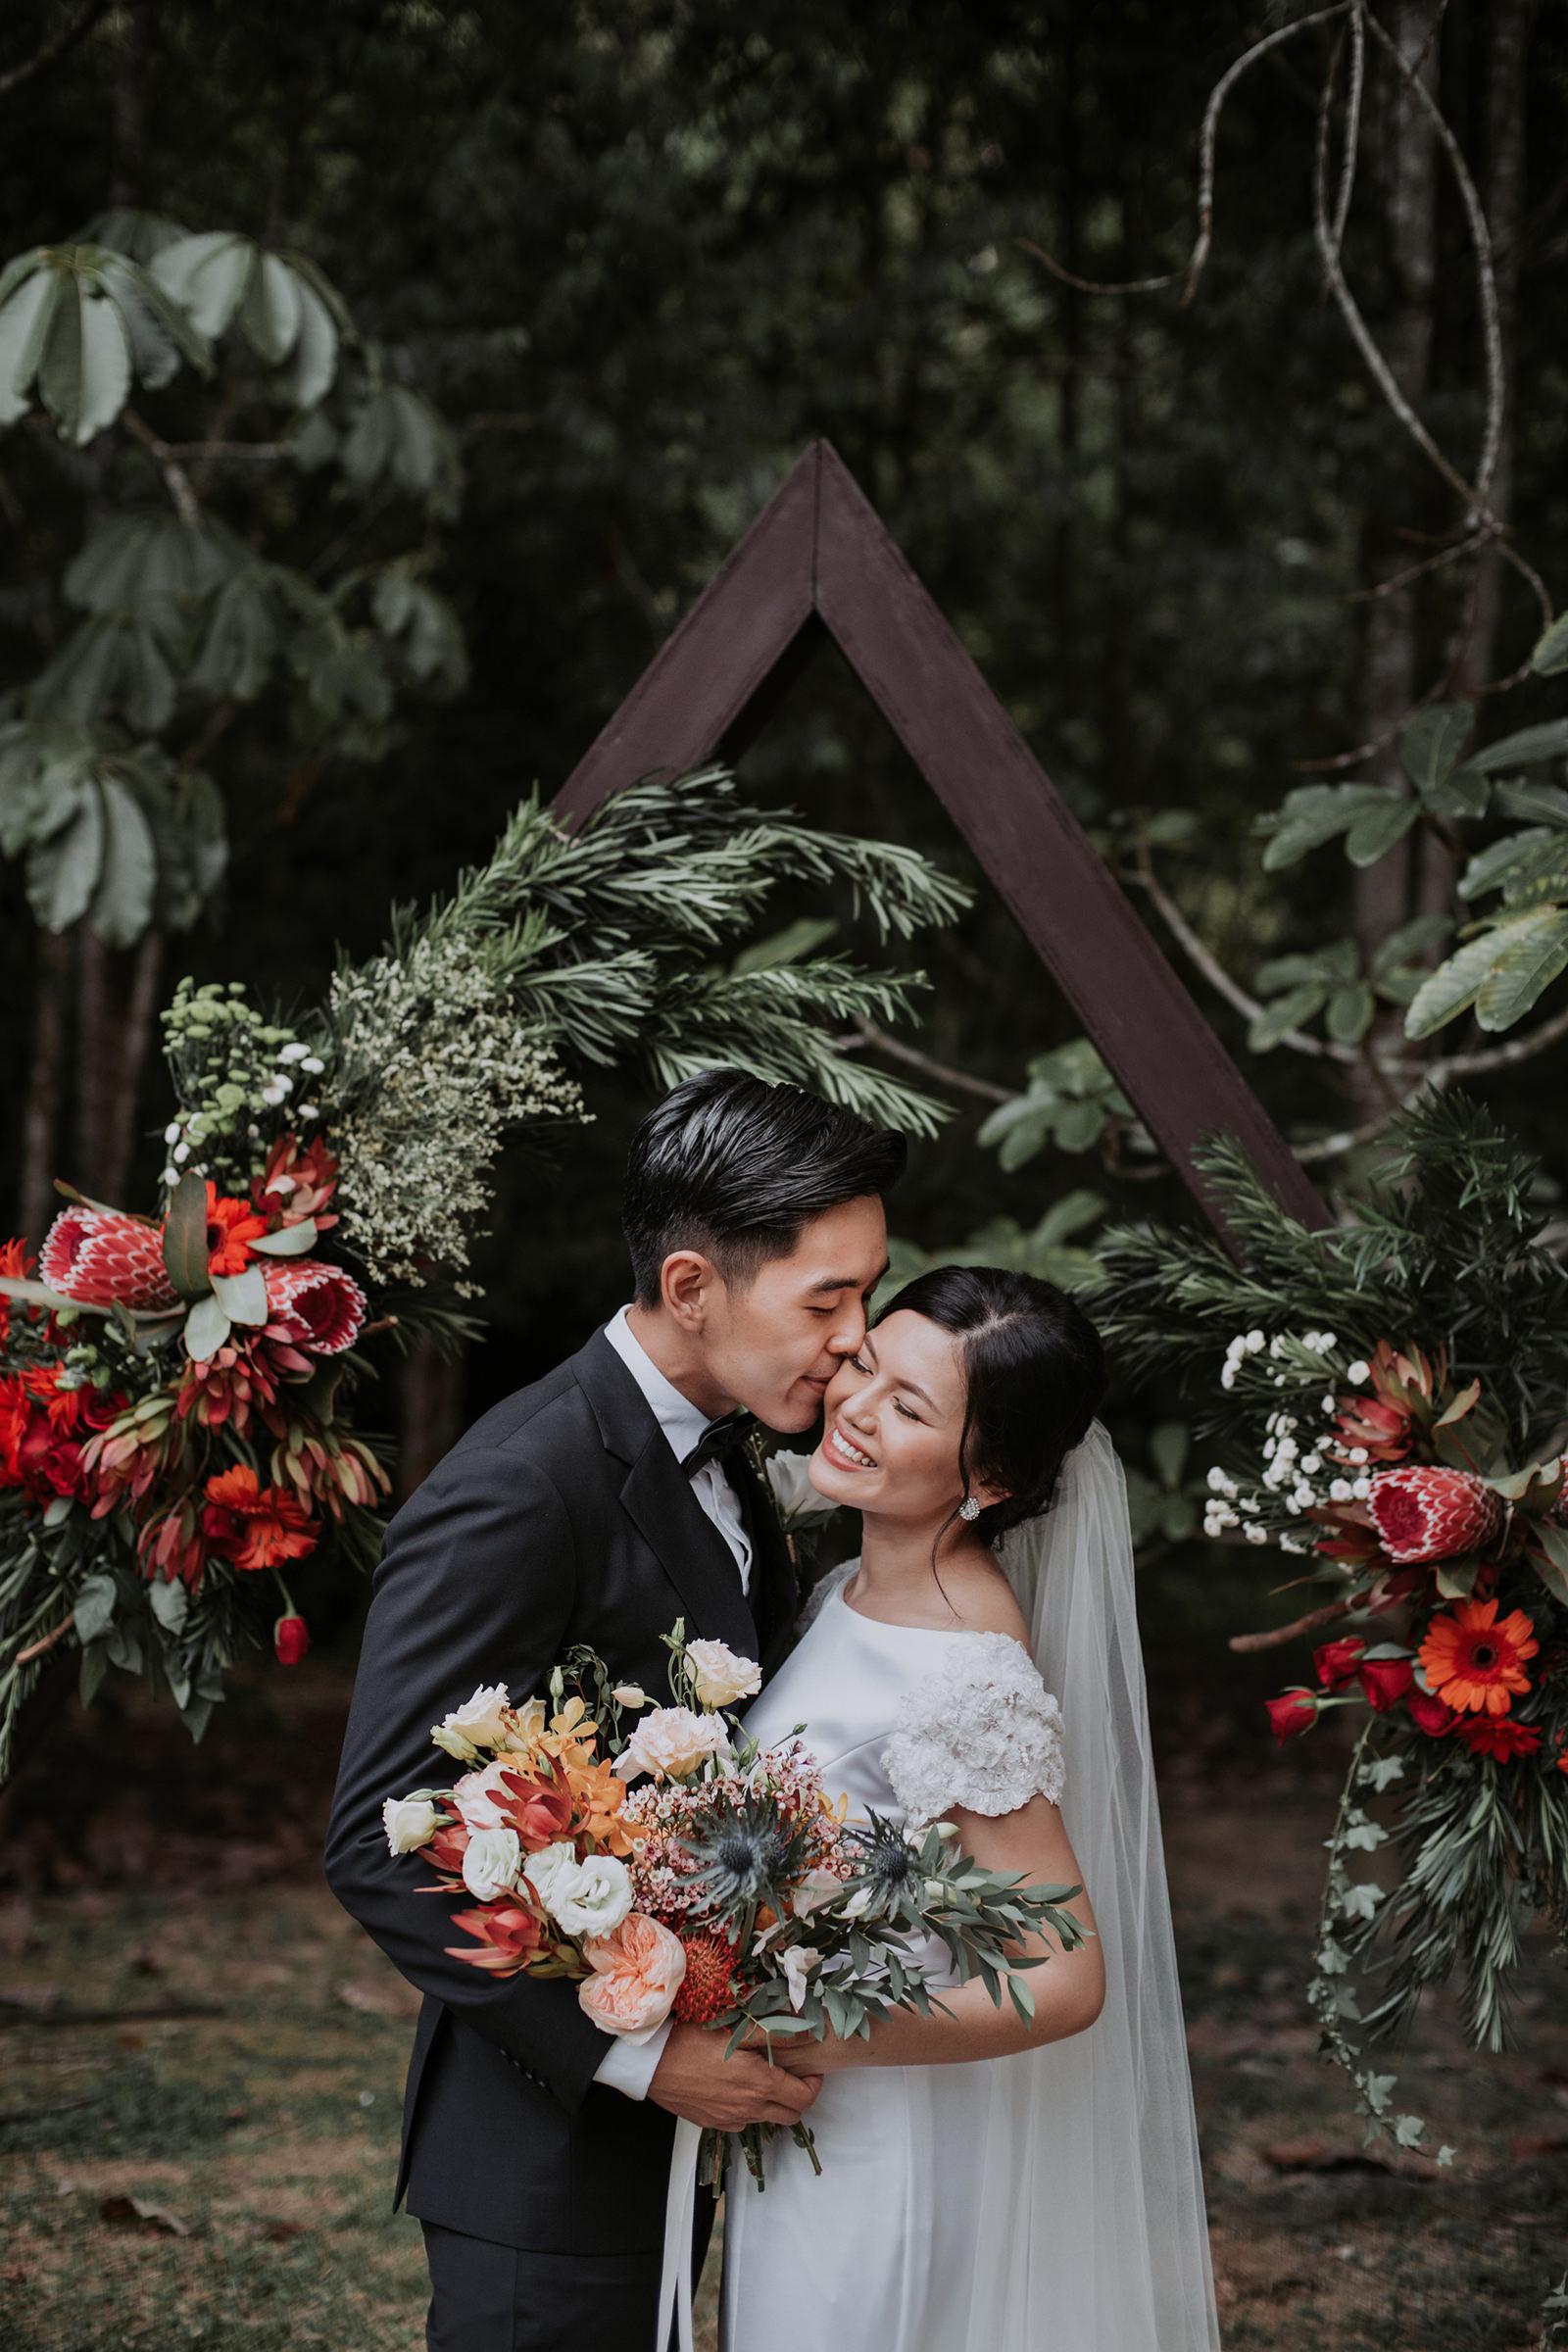 Groom kisses bride on the cheek. Photo by MunKeat Photography Studio